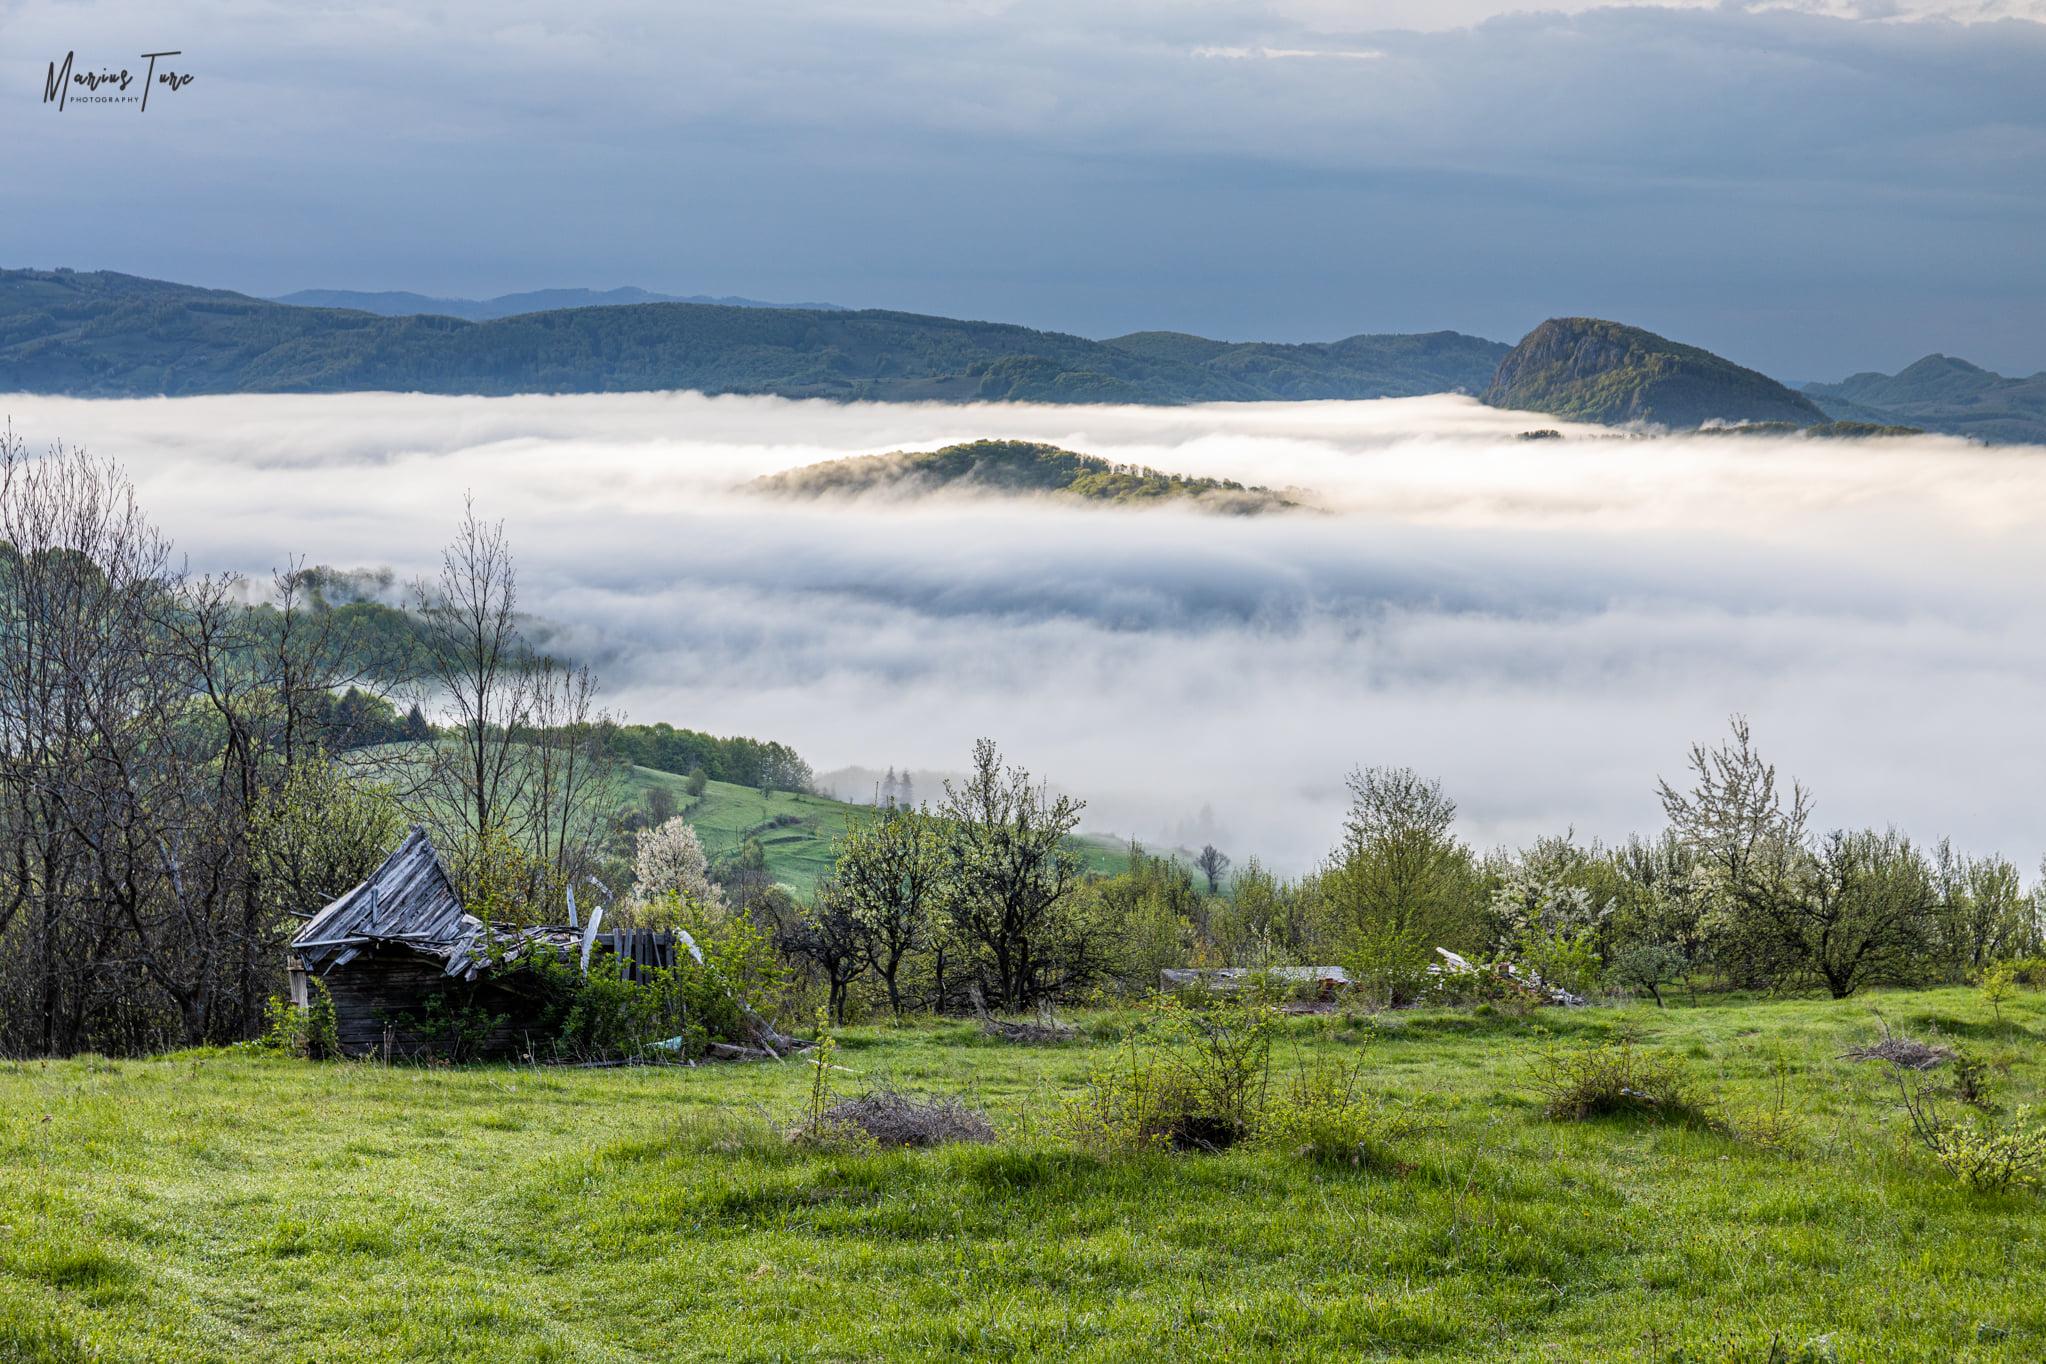 Ceata diminetii peste Tara Abrudului - Marius Turc